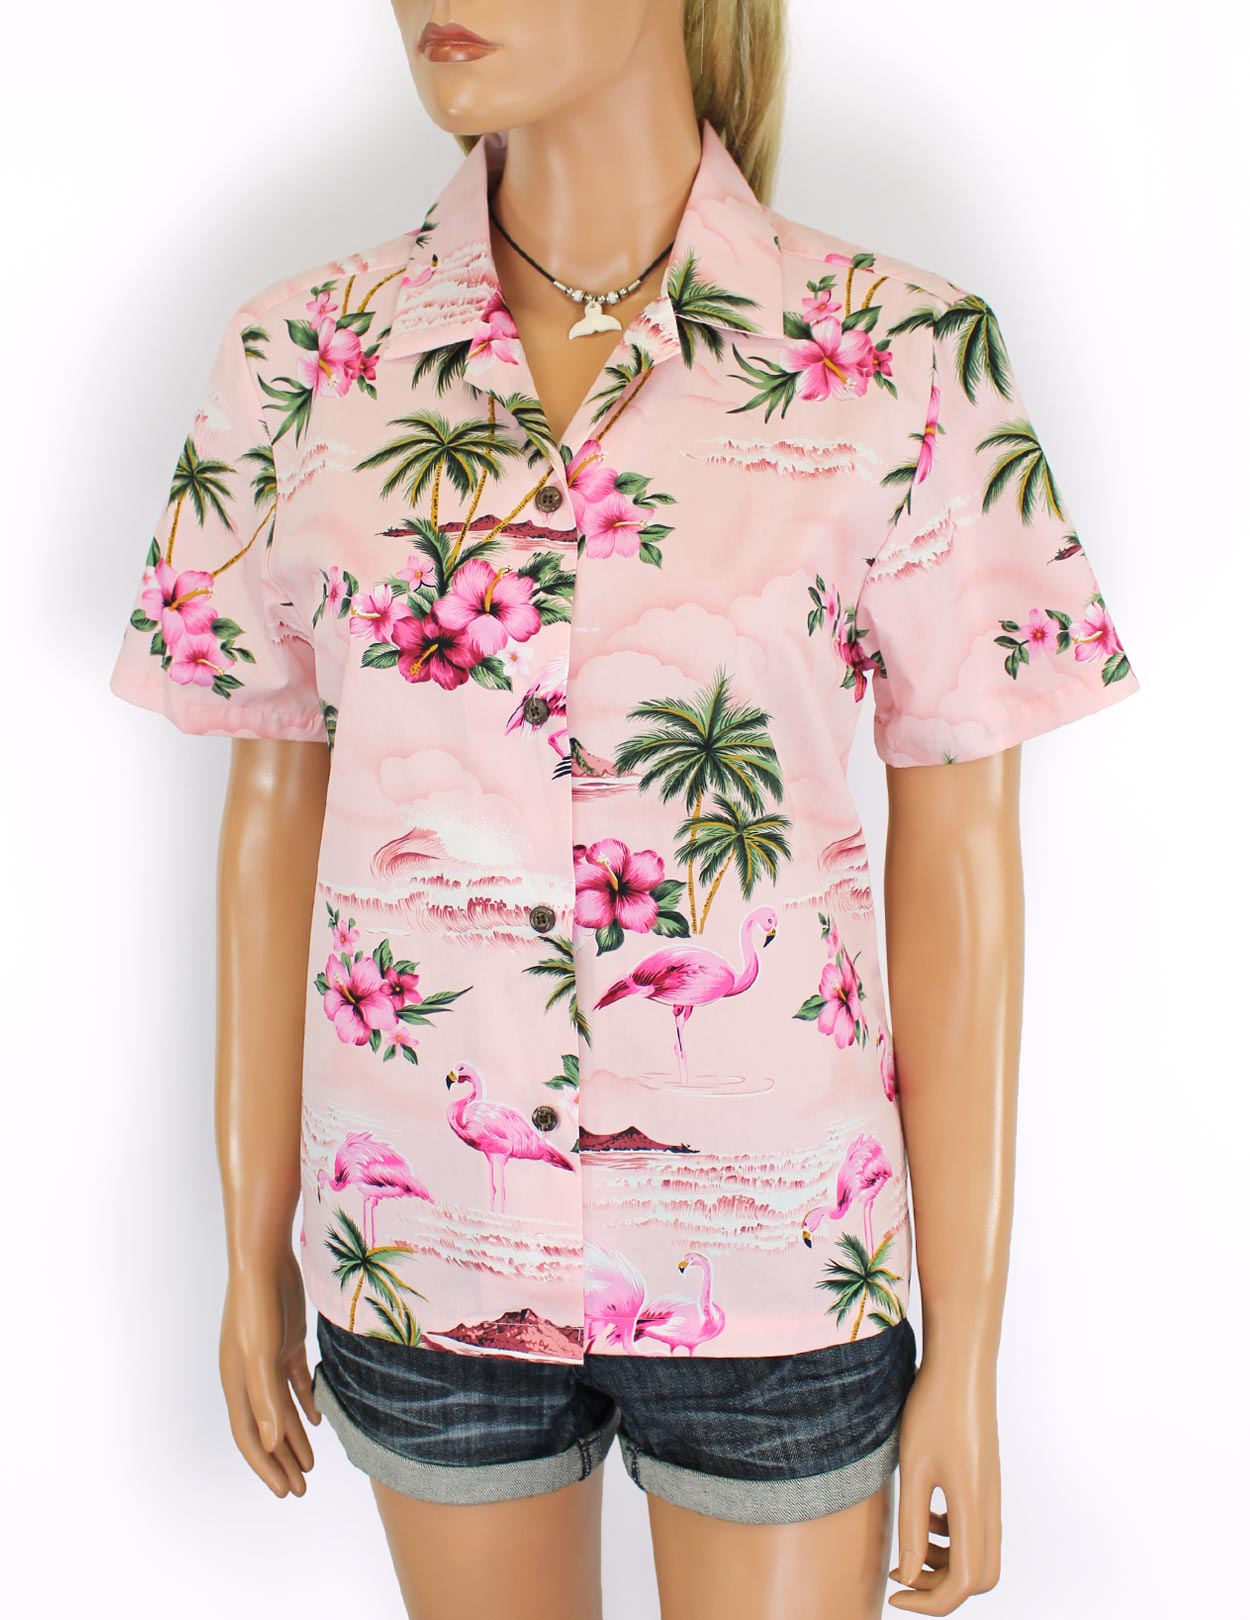 d5dff2c4 Florida Flamingos Aloha Camp Shirt for Women: Shaka Time Hawaii Clothing  Store